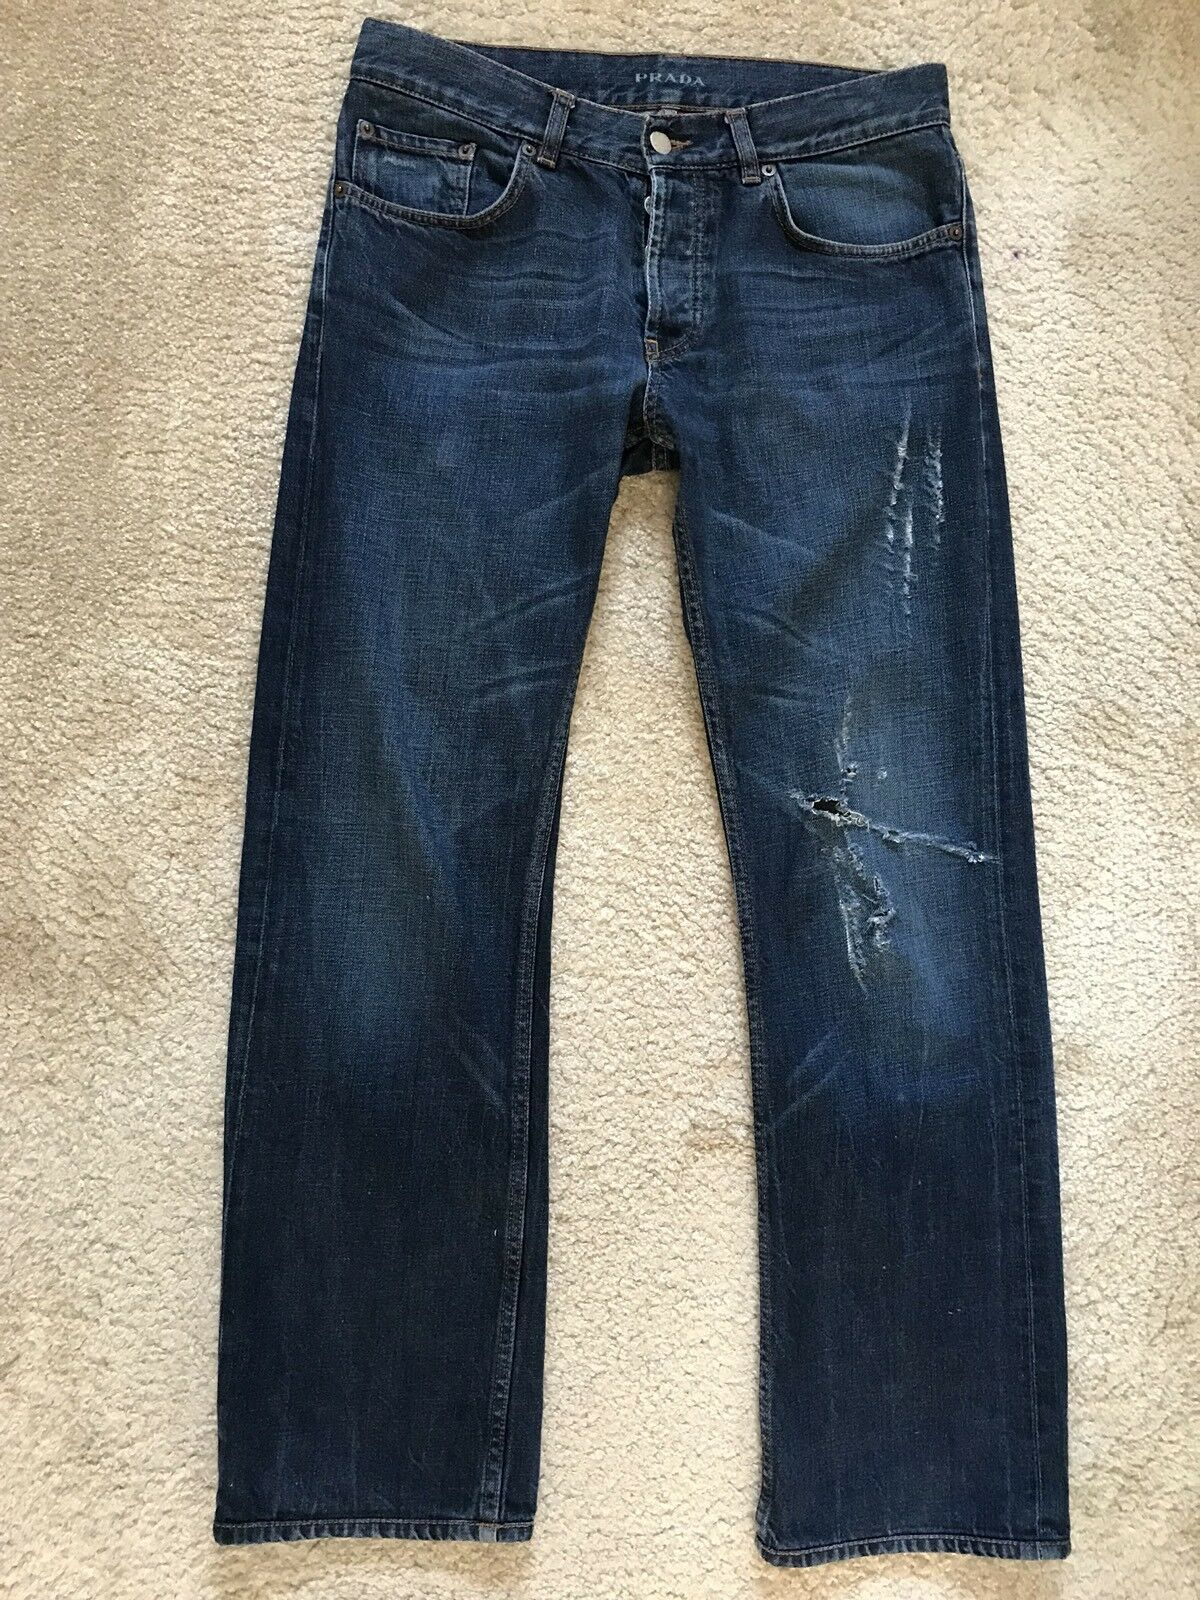 PRADA Men's Classic Fit Ripped Jeans bluee Size  W32 X 30